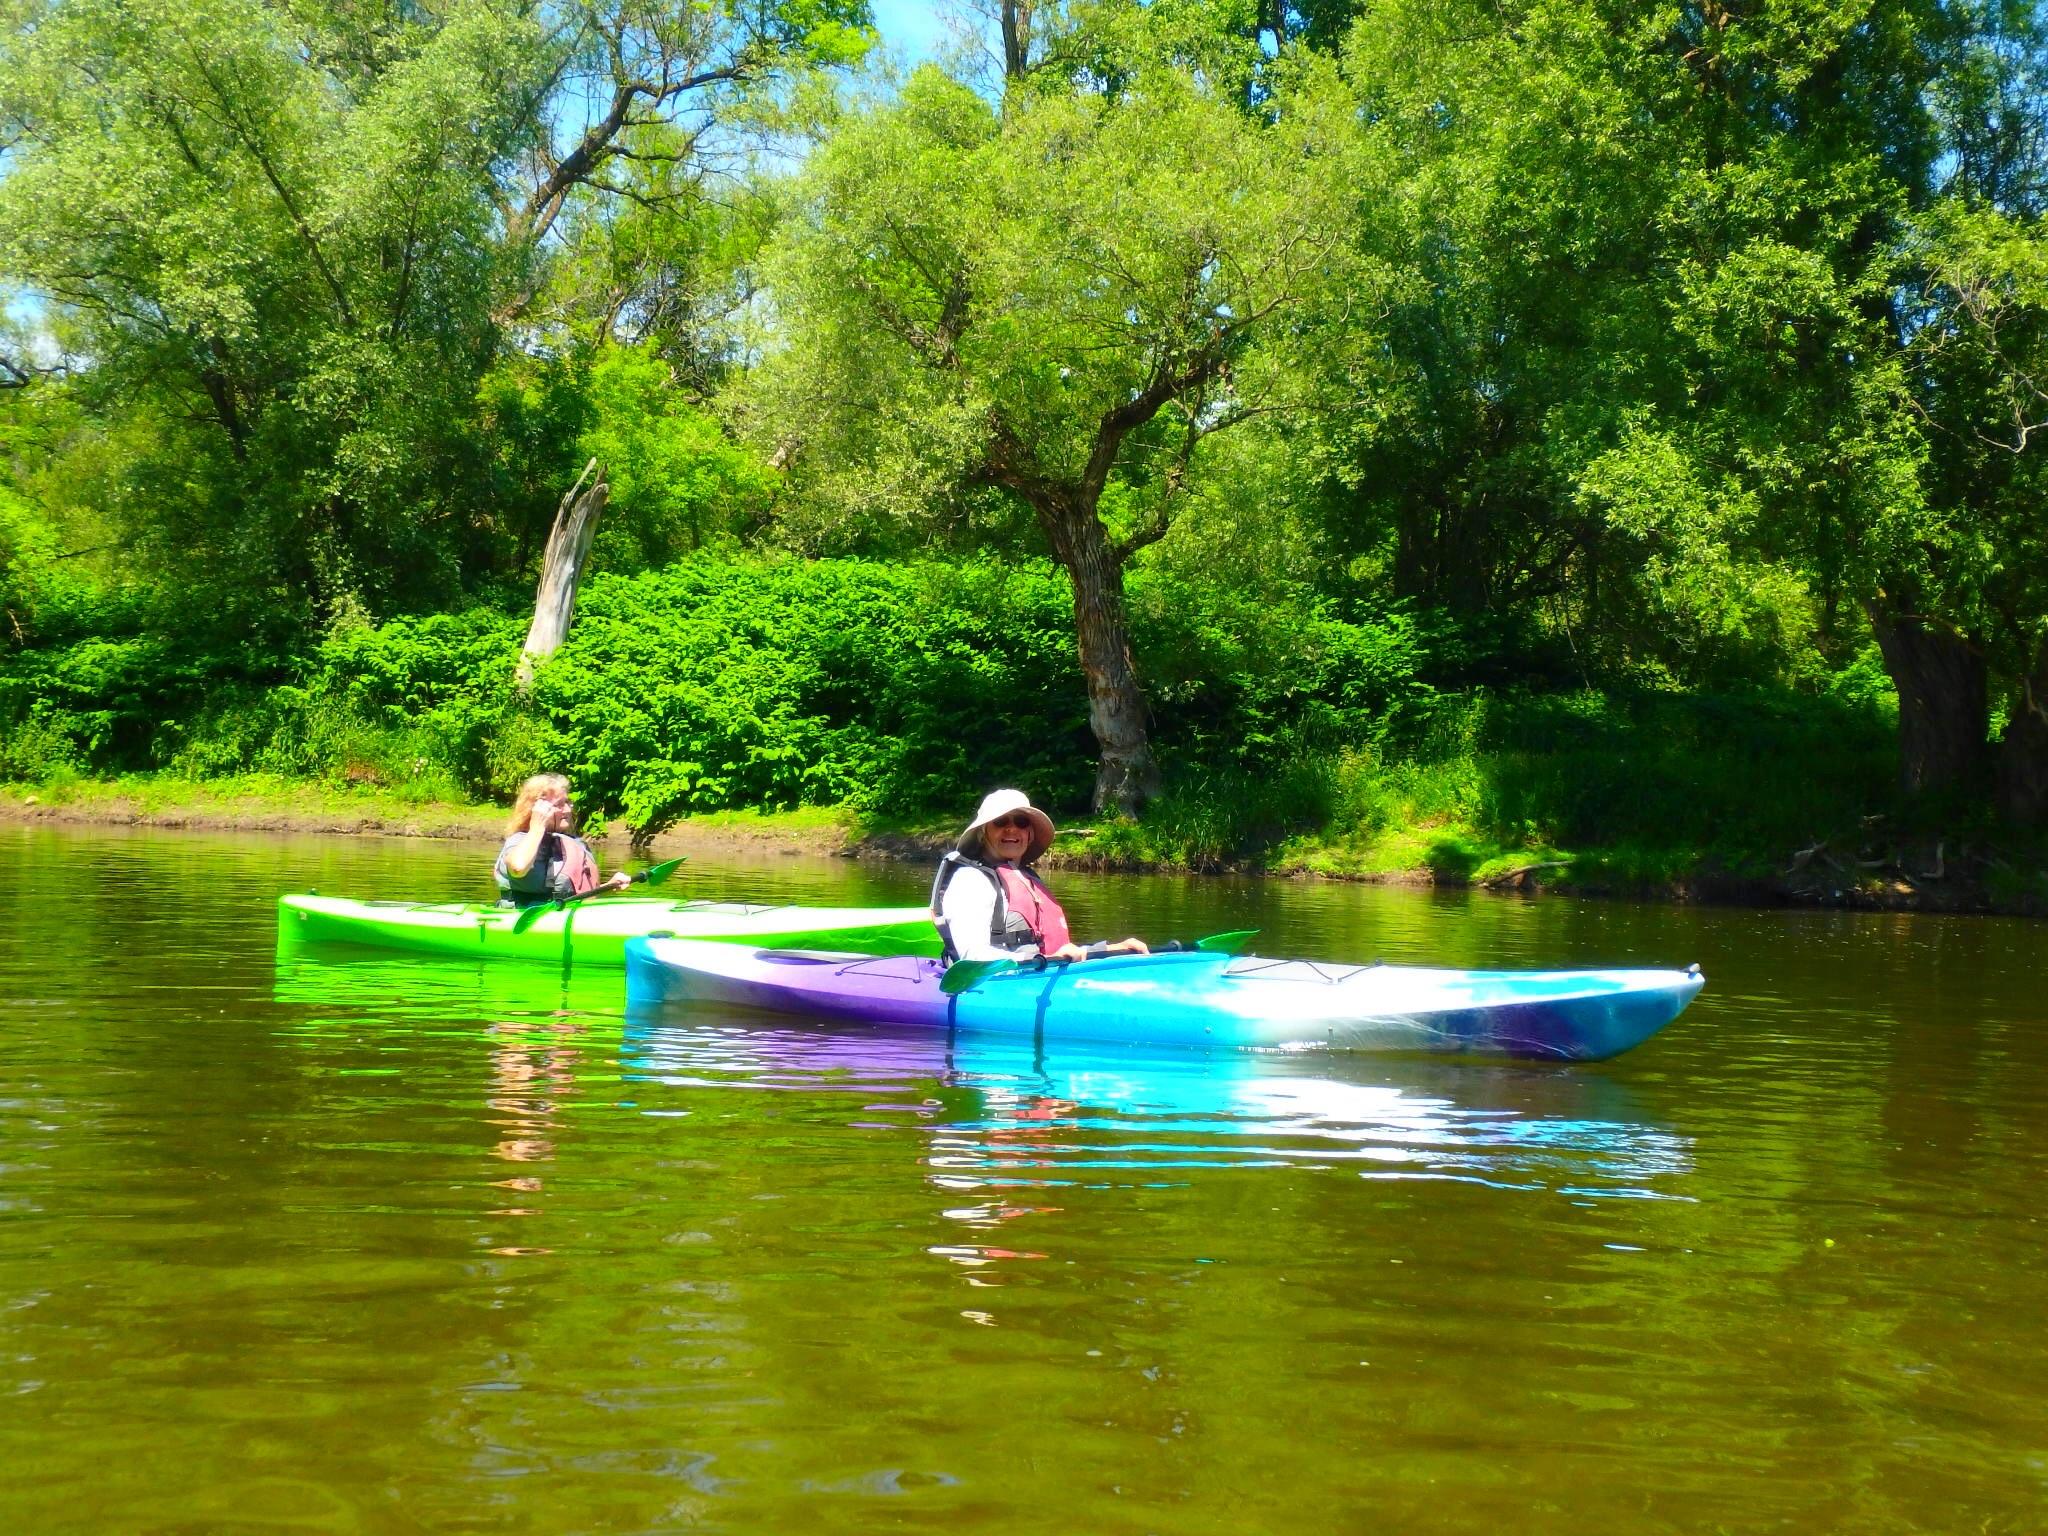 Kayaking Yoga Meditation - Solstice - Jun 21 2018-71